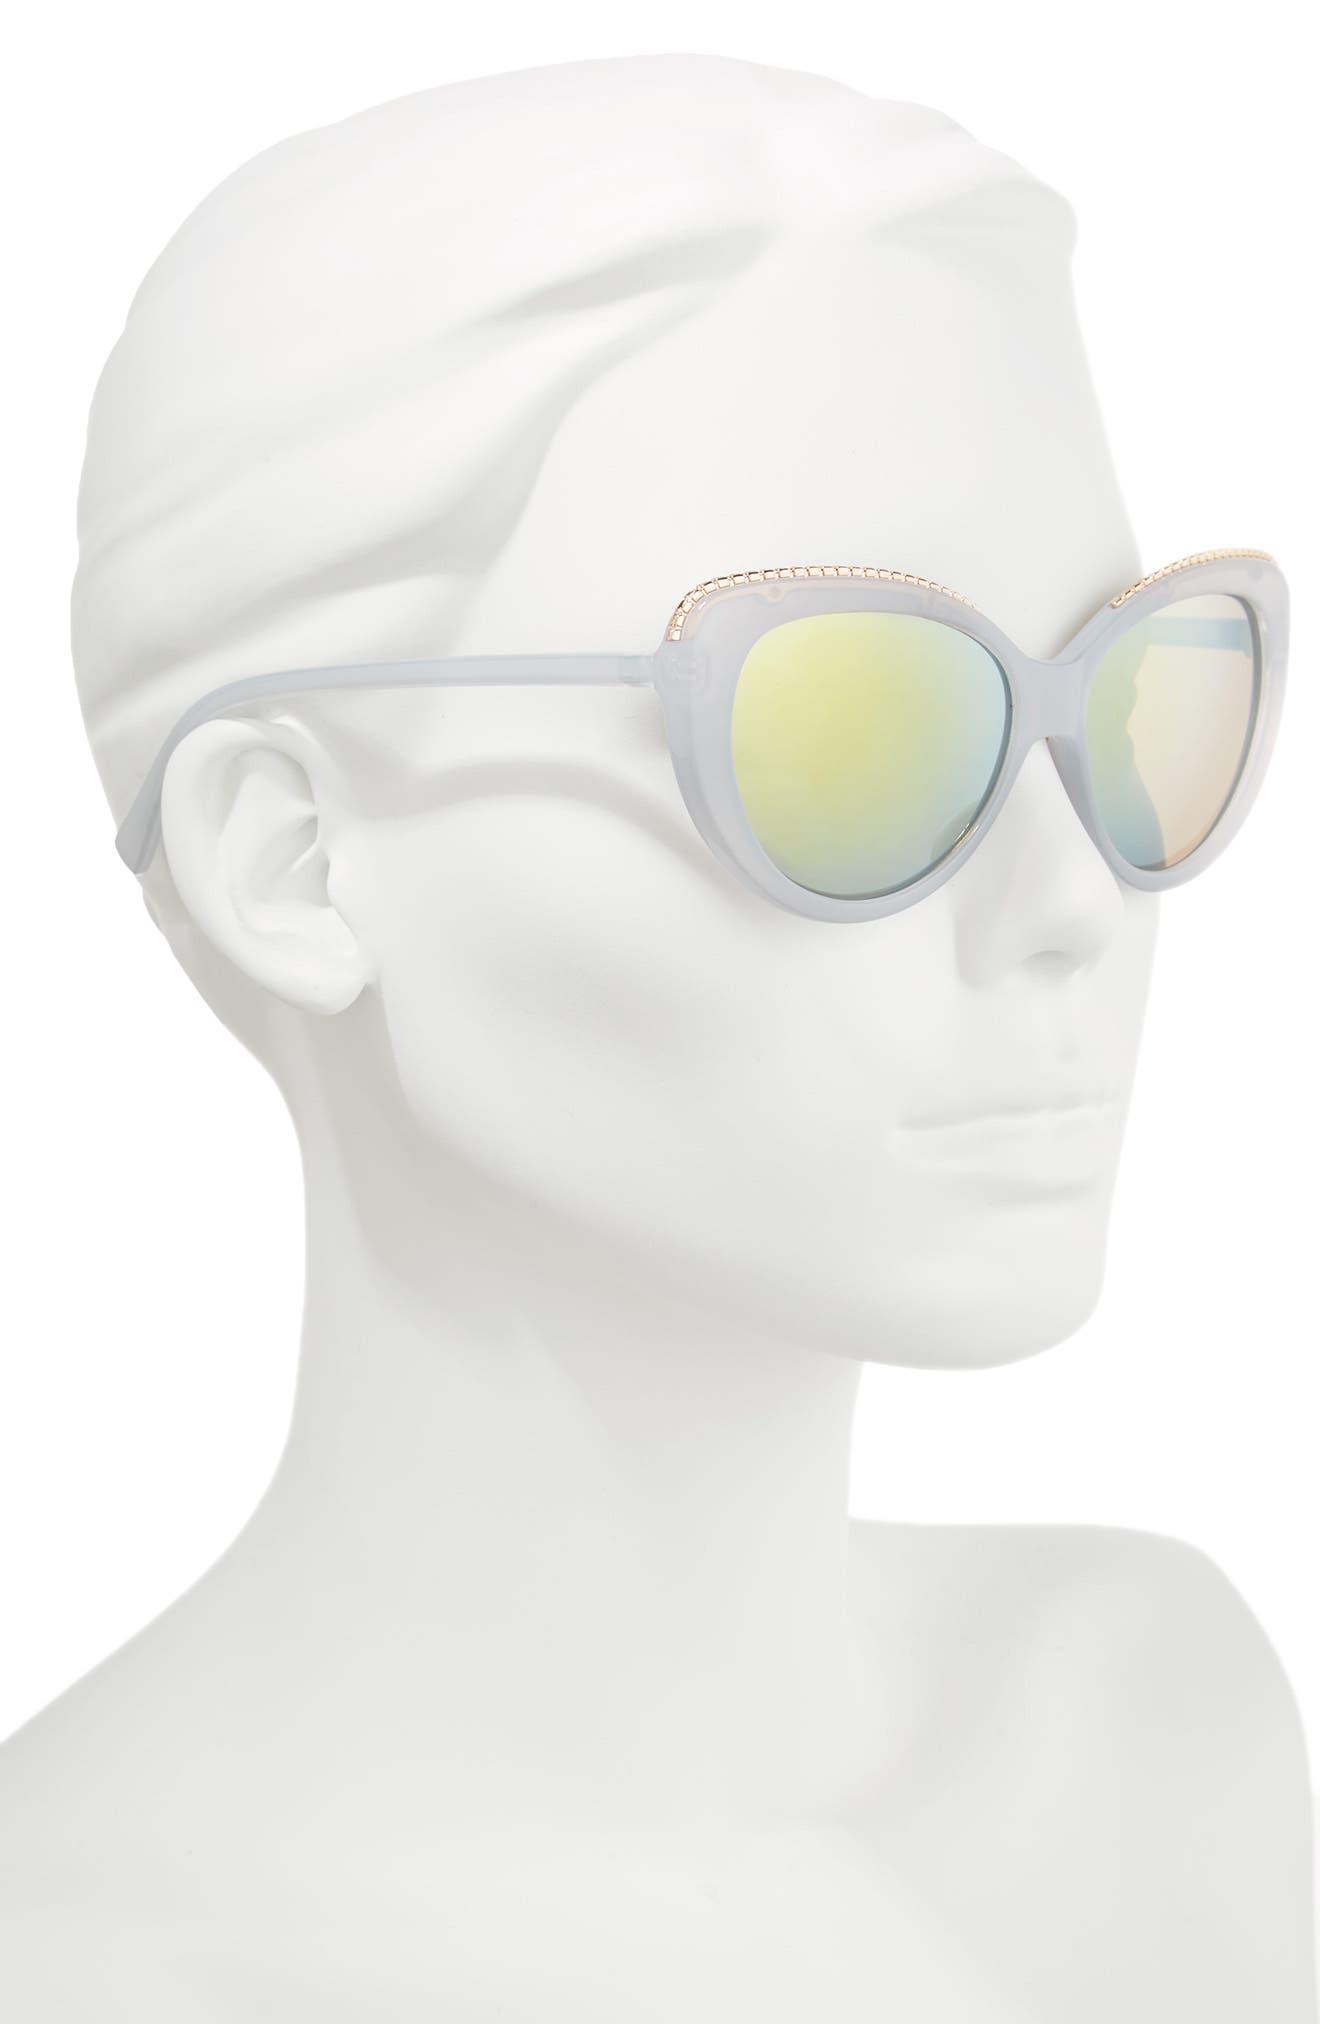 54mm Metal Trim Sunglasses,                             Alternate thumbnail 2, color,                             Blue